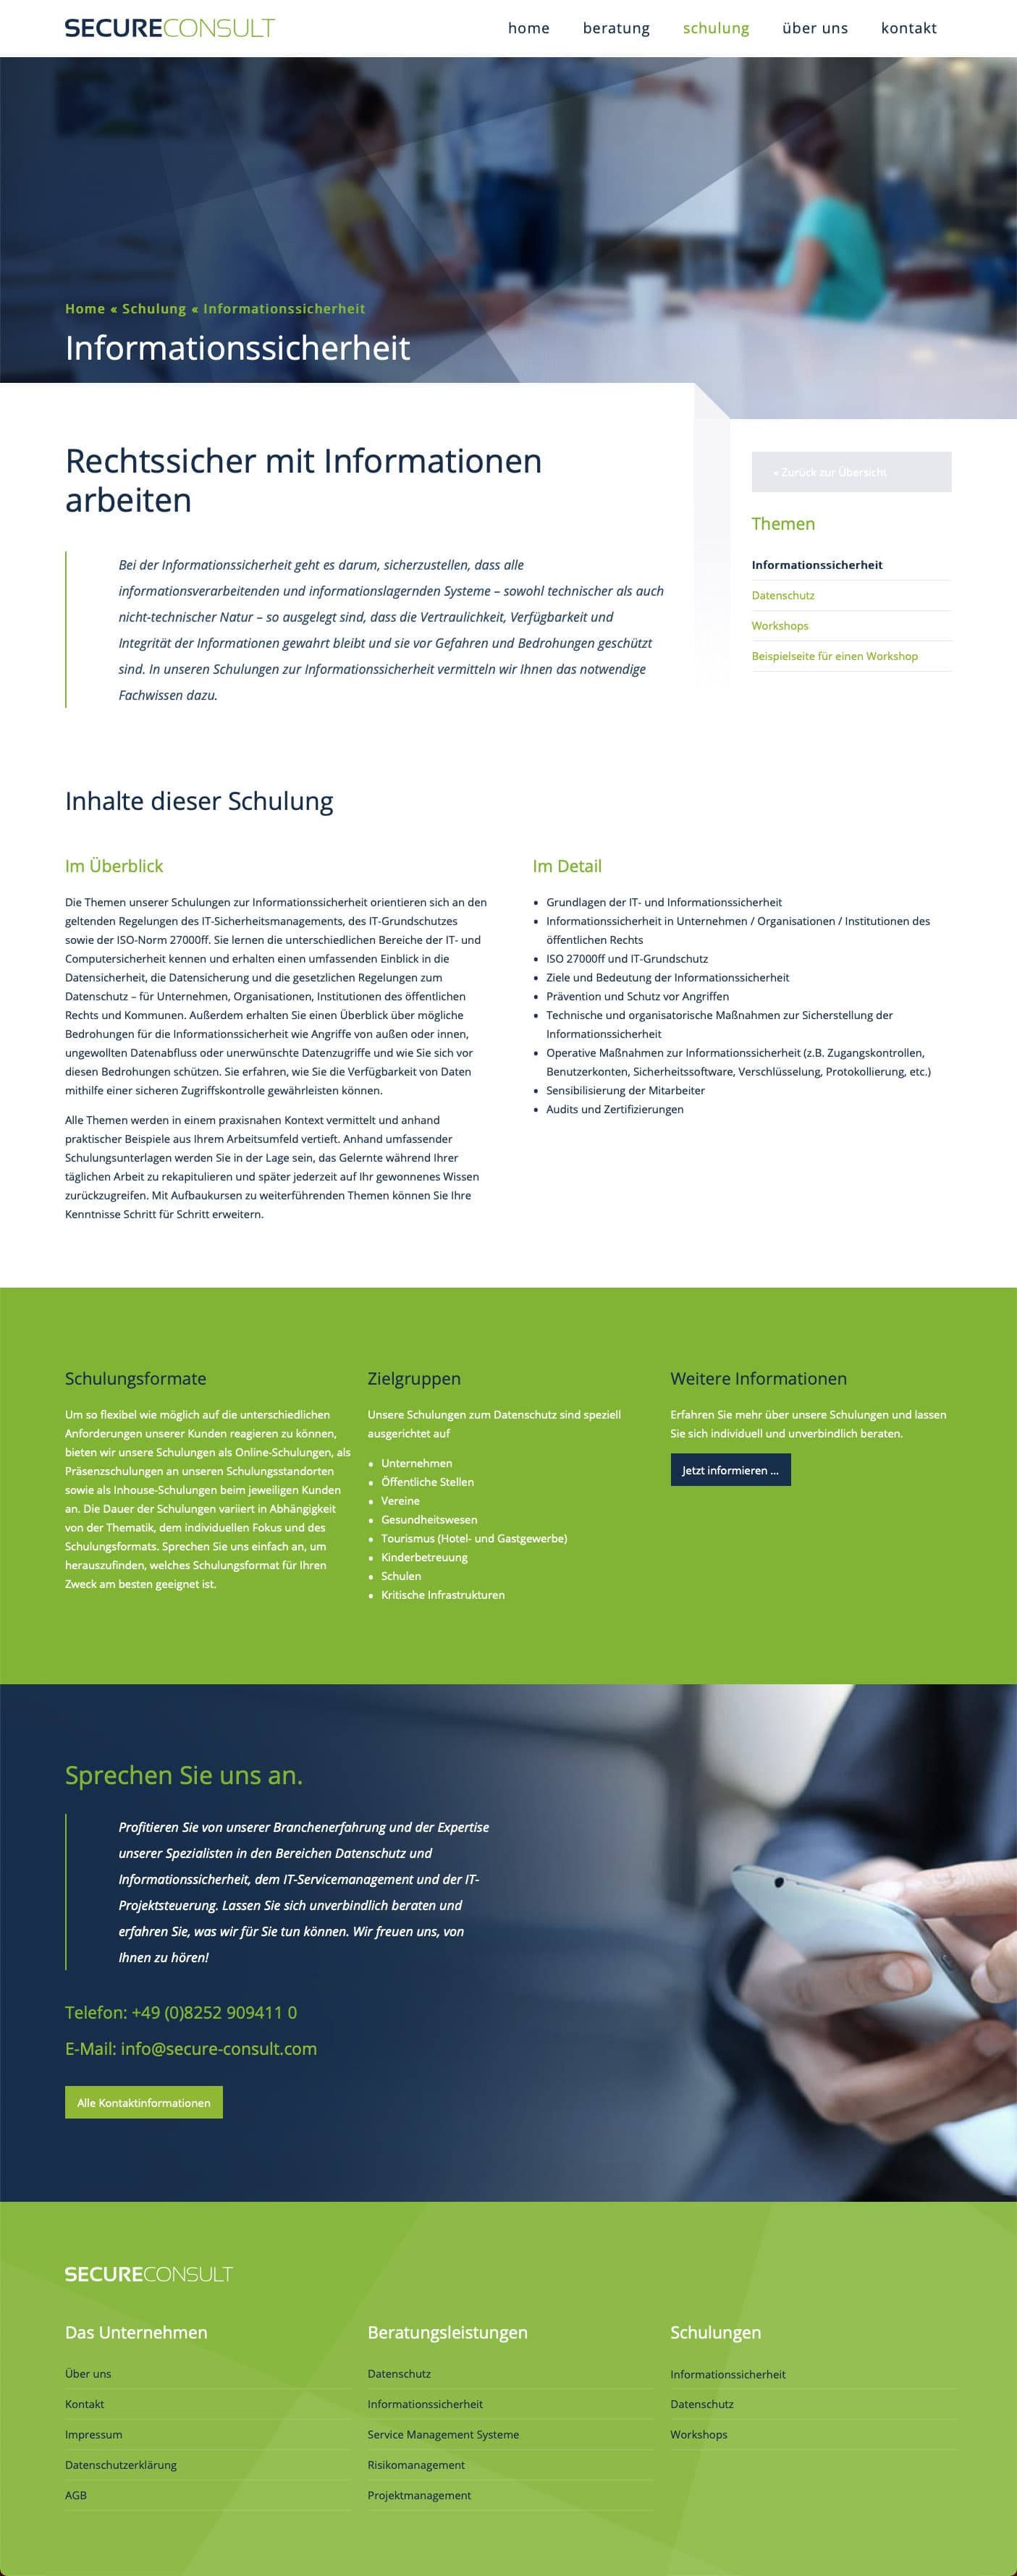 Webdesign Berlin Sicherheitsberatung